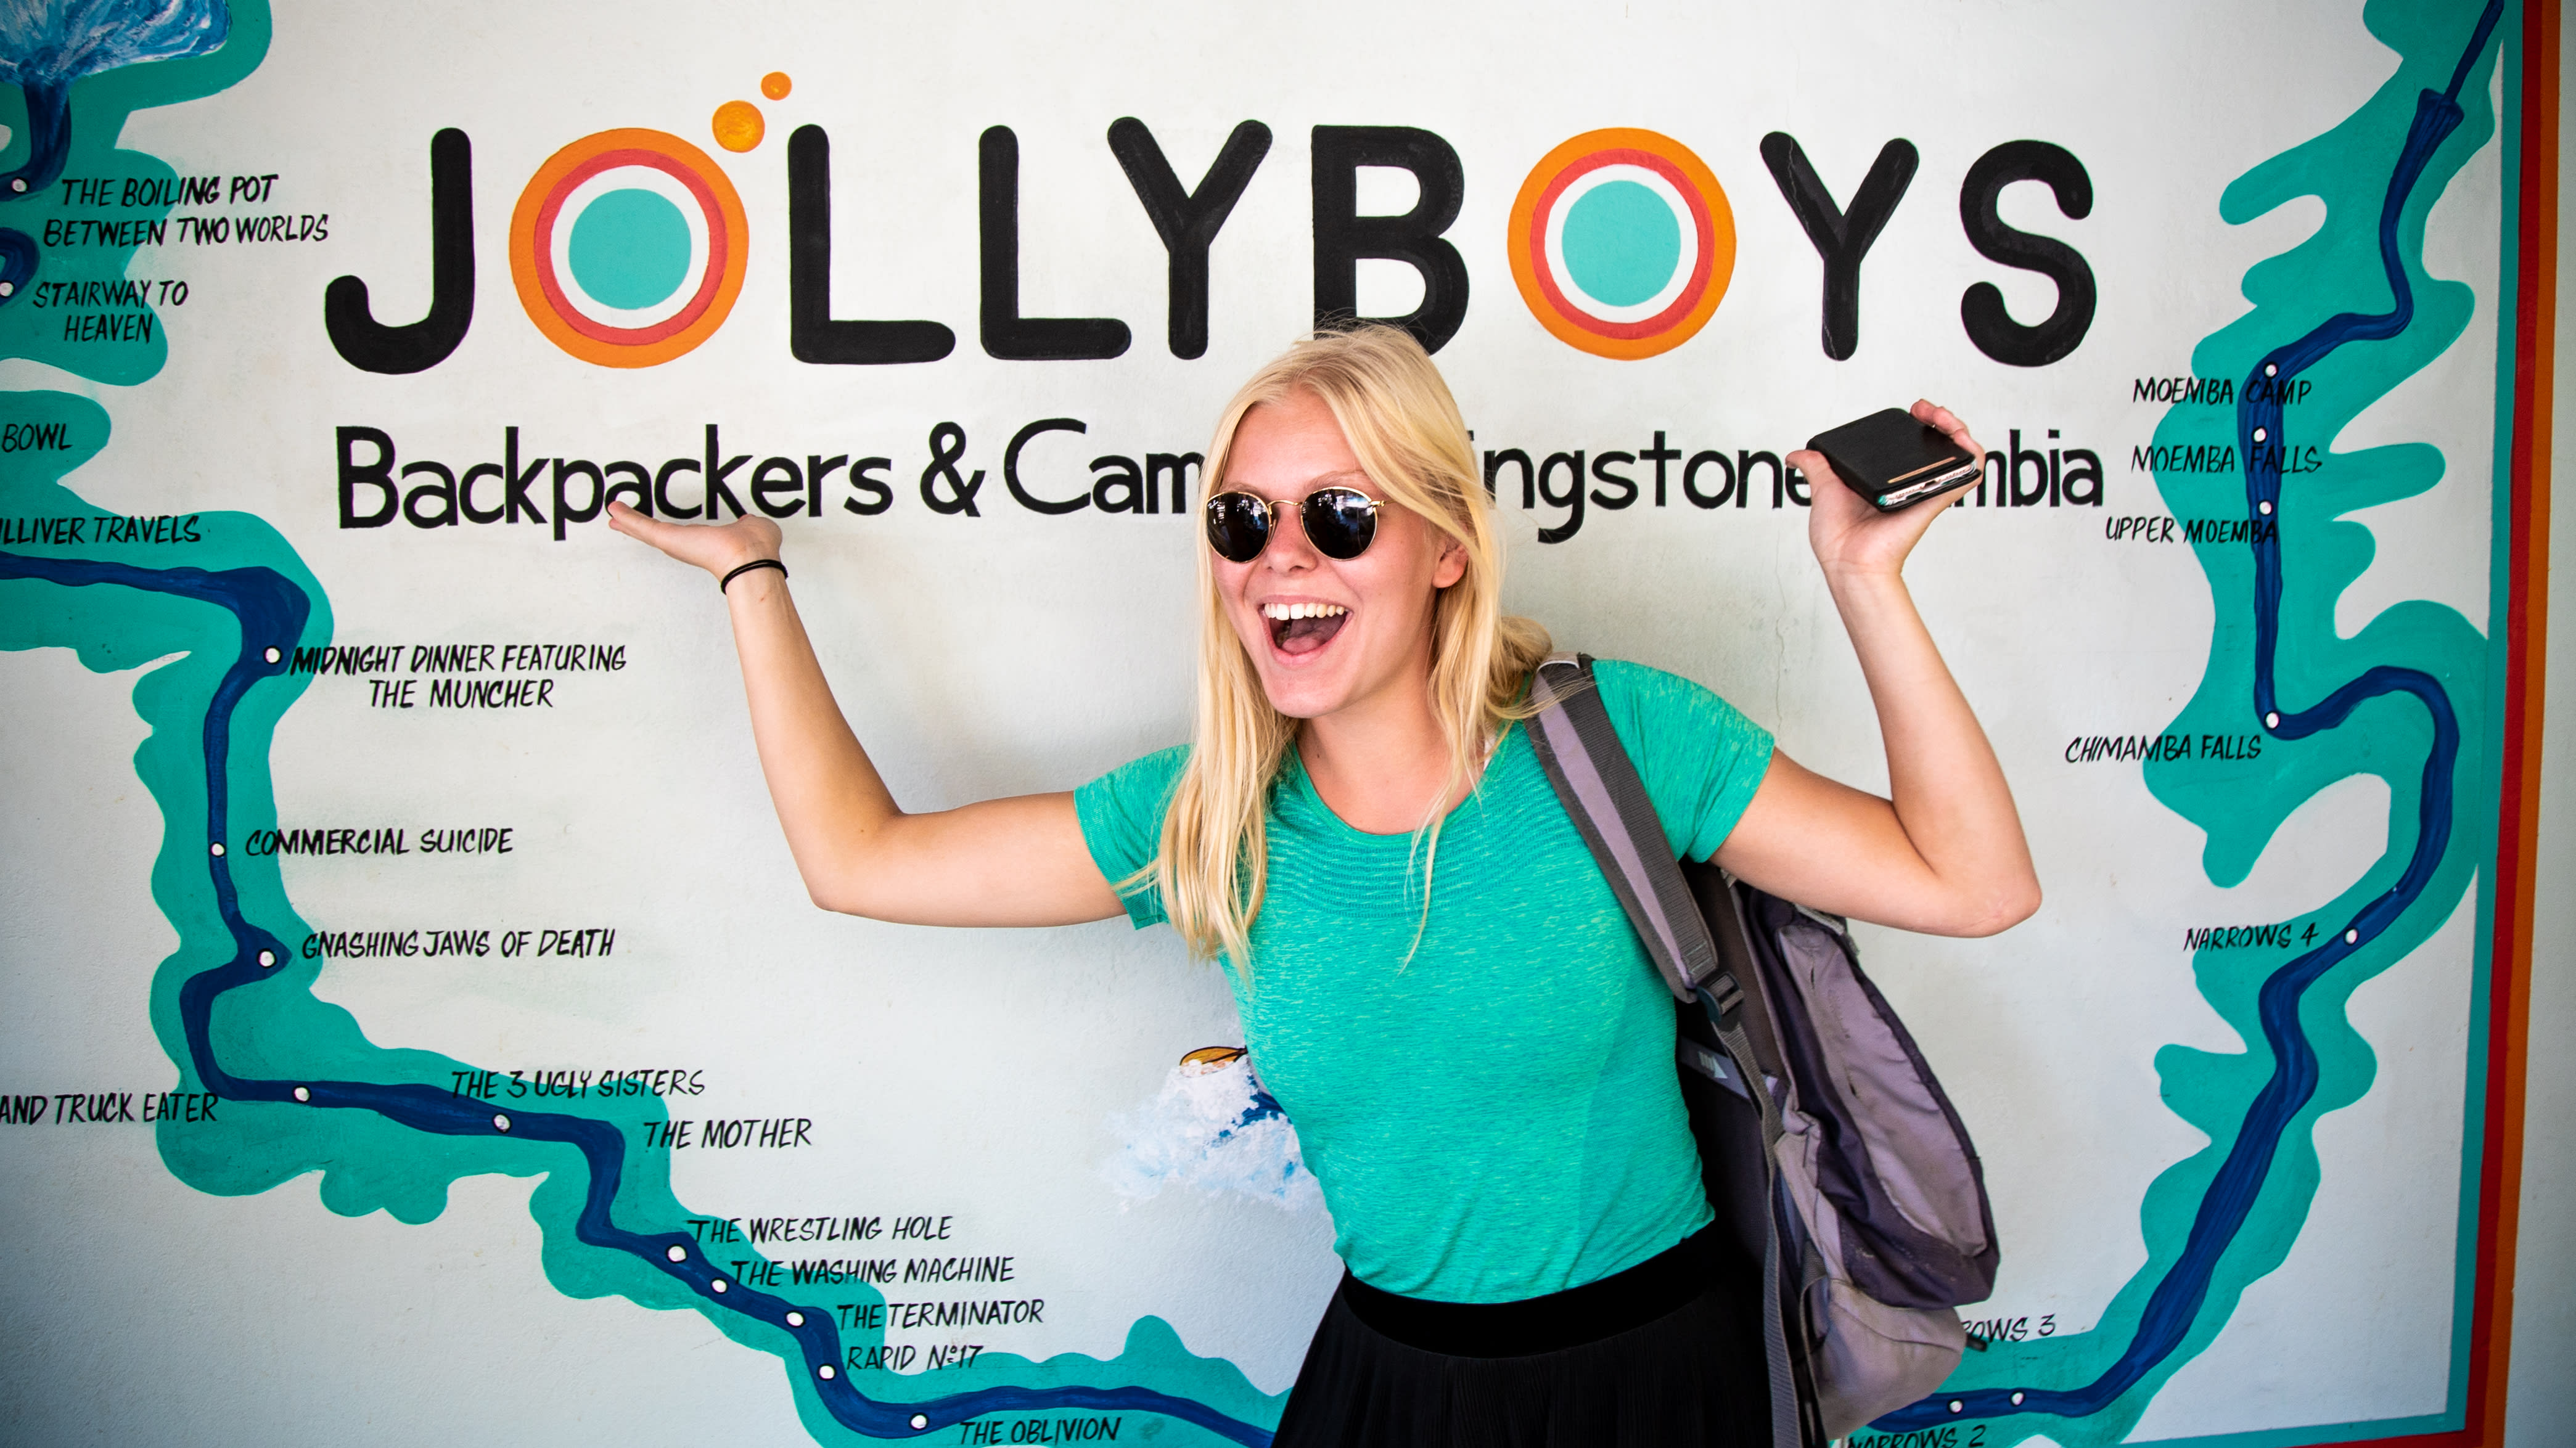 Jollyboys Backpackers